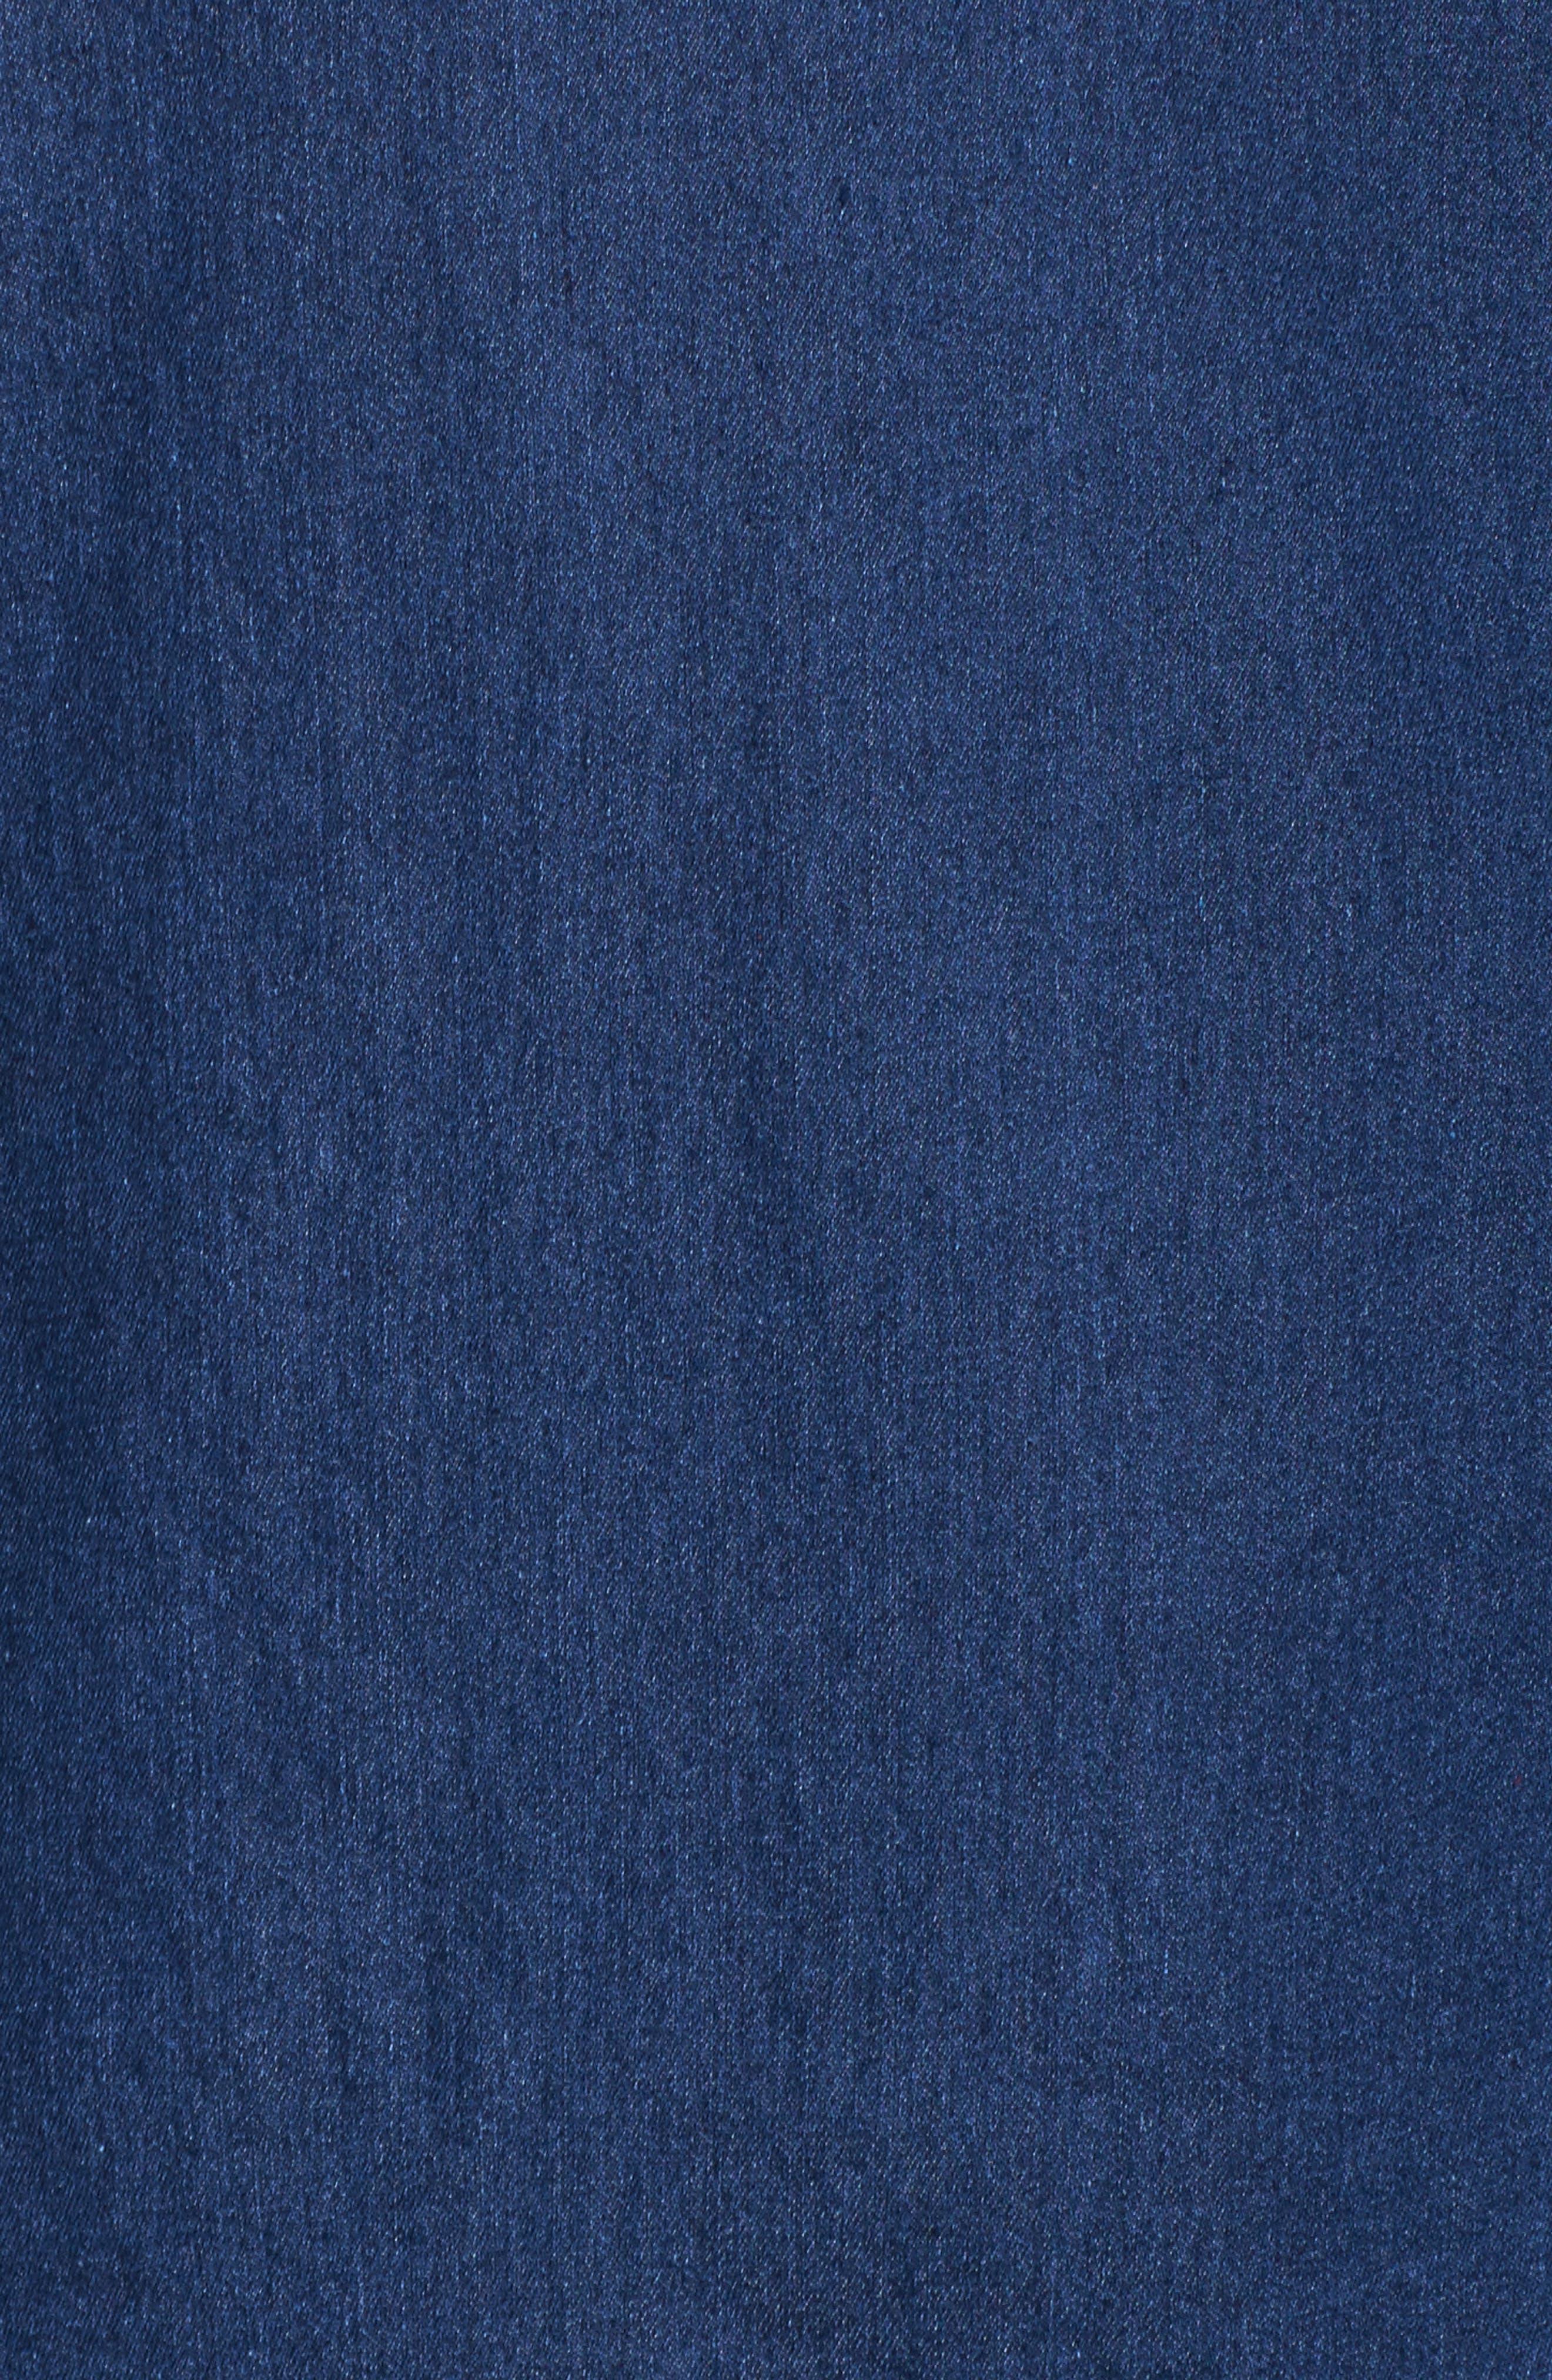 Blouson Sleeve Denim Top,                             Alternate thumbnail 5, color,                             401